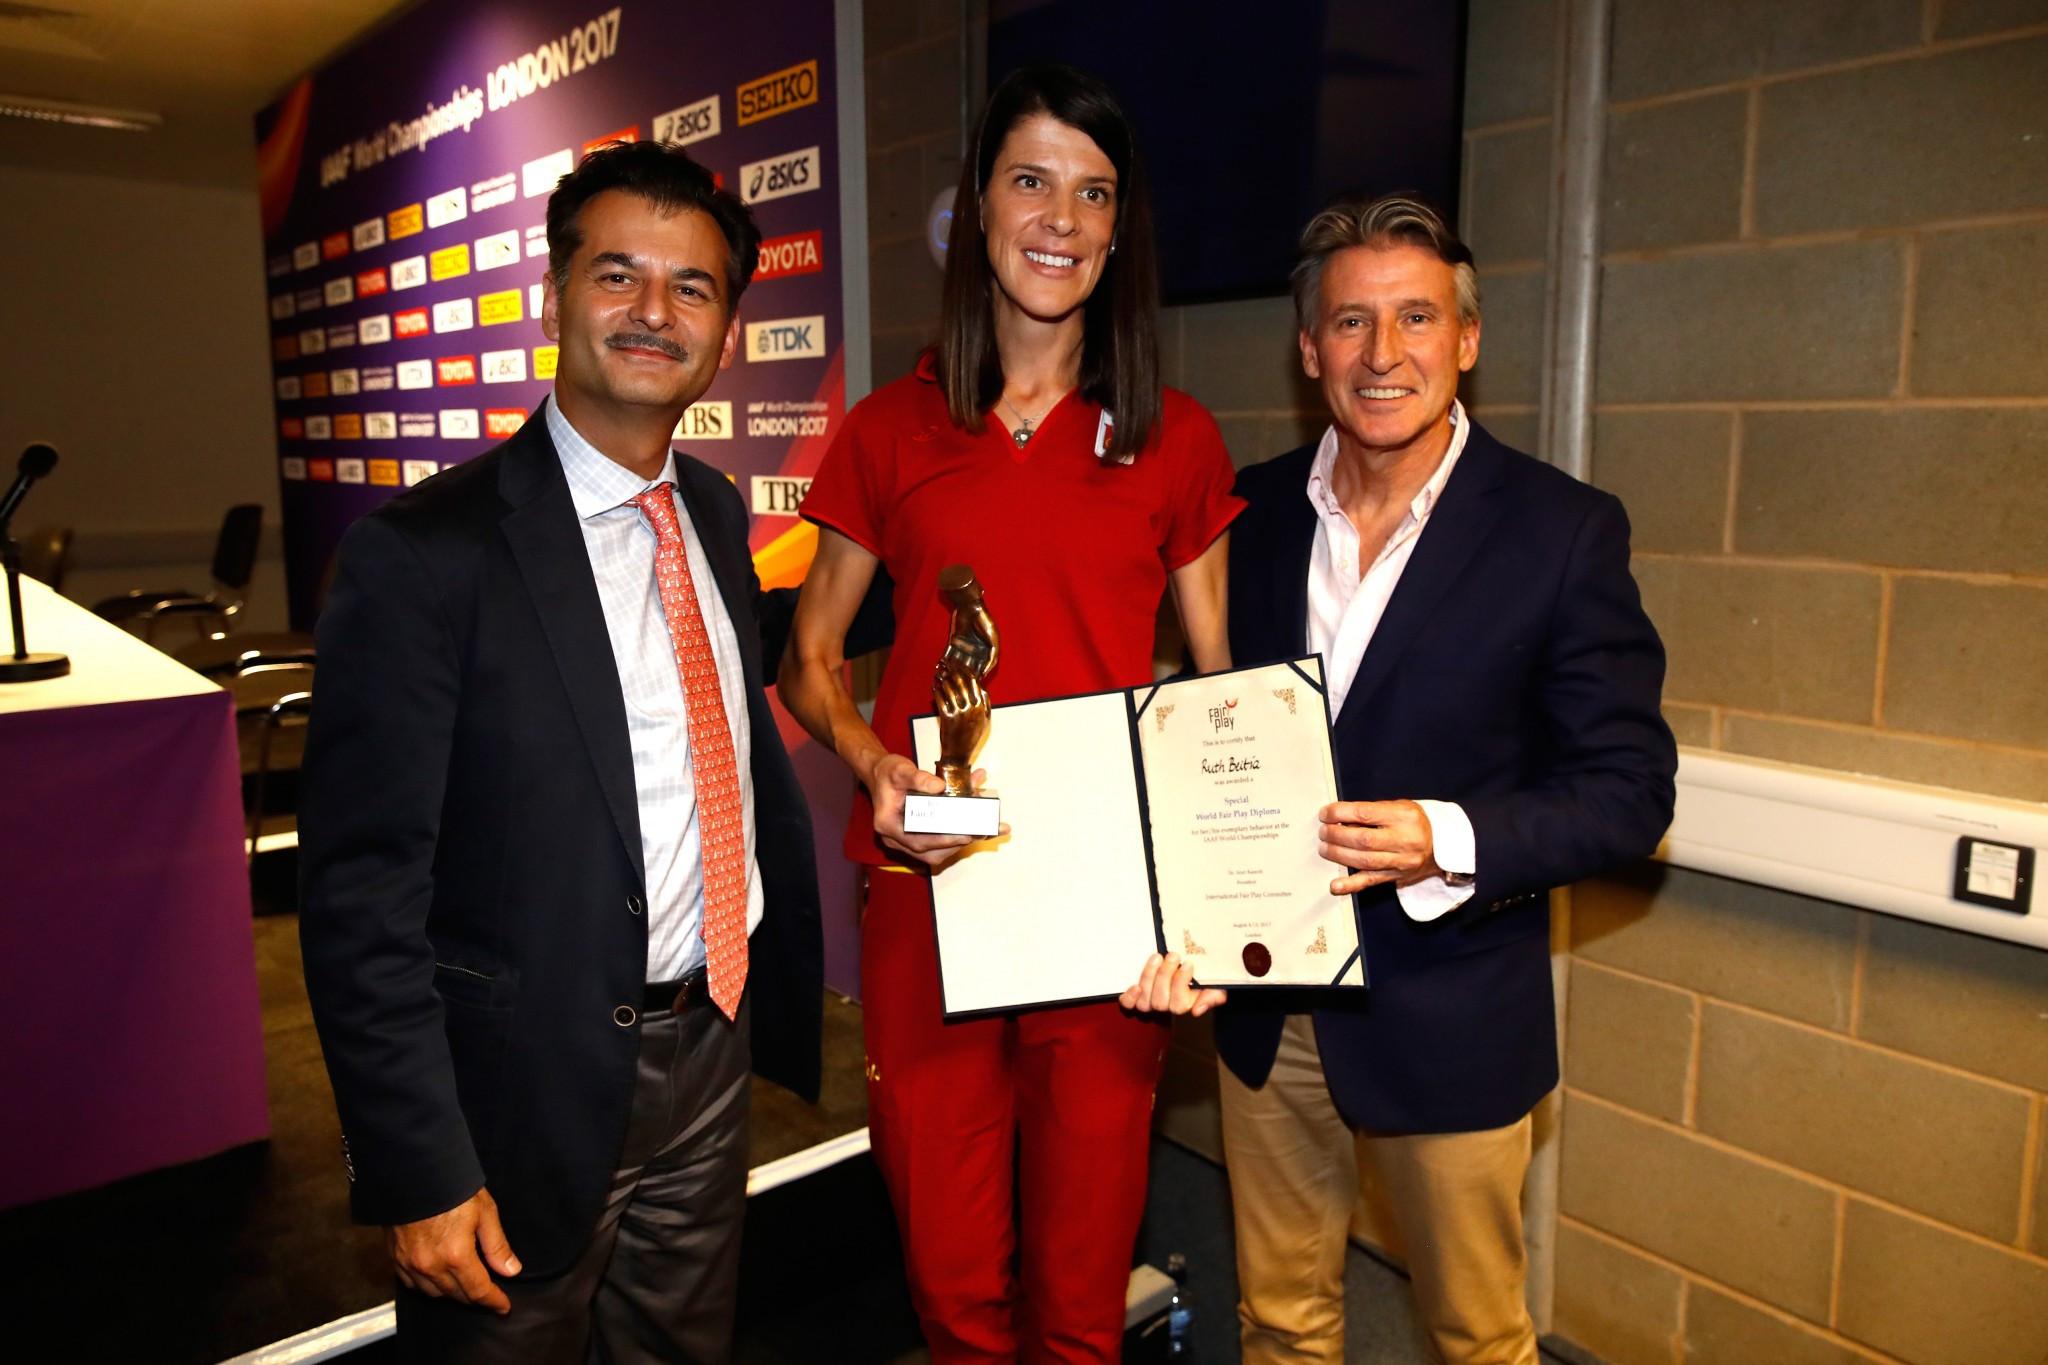 Olympic champion Beitia receives fair play award at IAAF World Championships